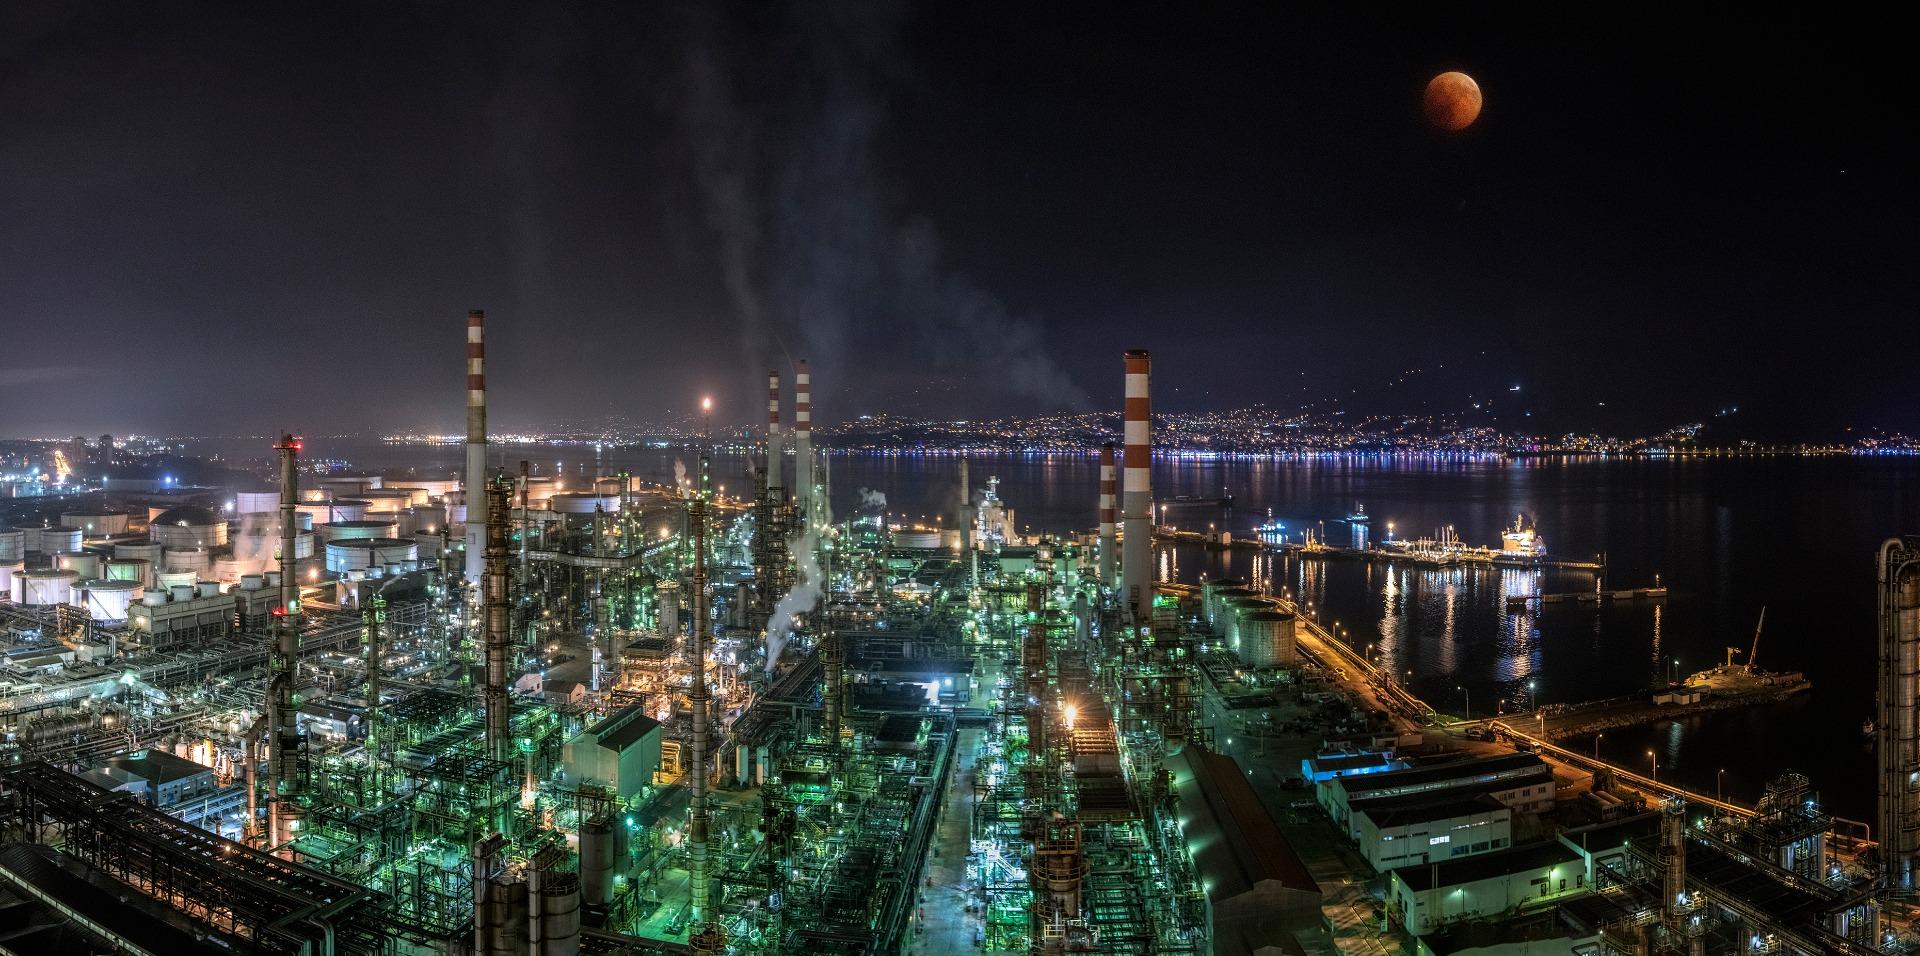 Tüpraş'tan 22,2 milyon ton satış 179 milyon dolar yatırım